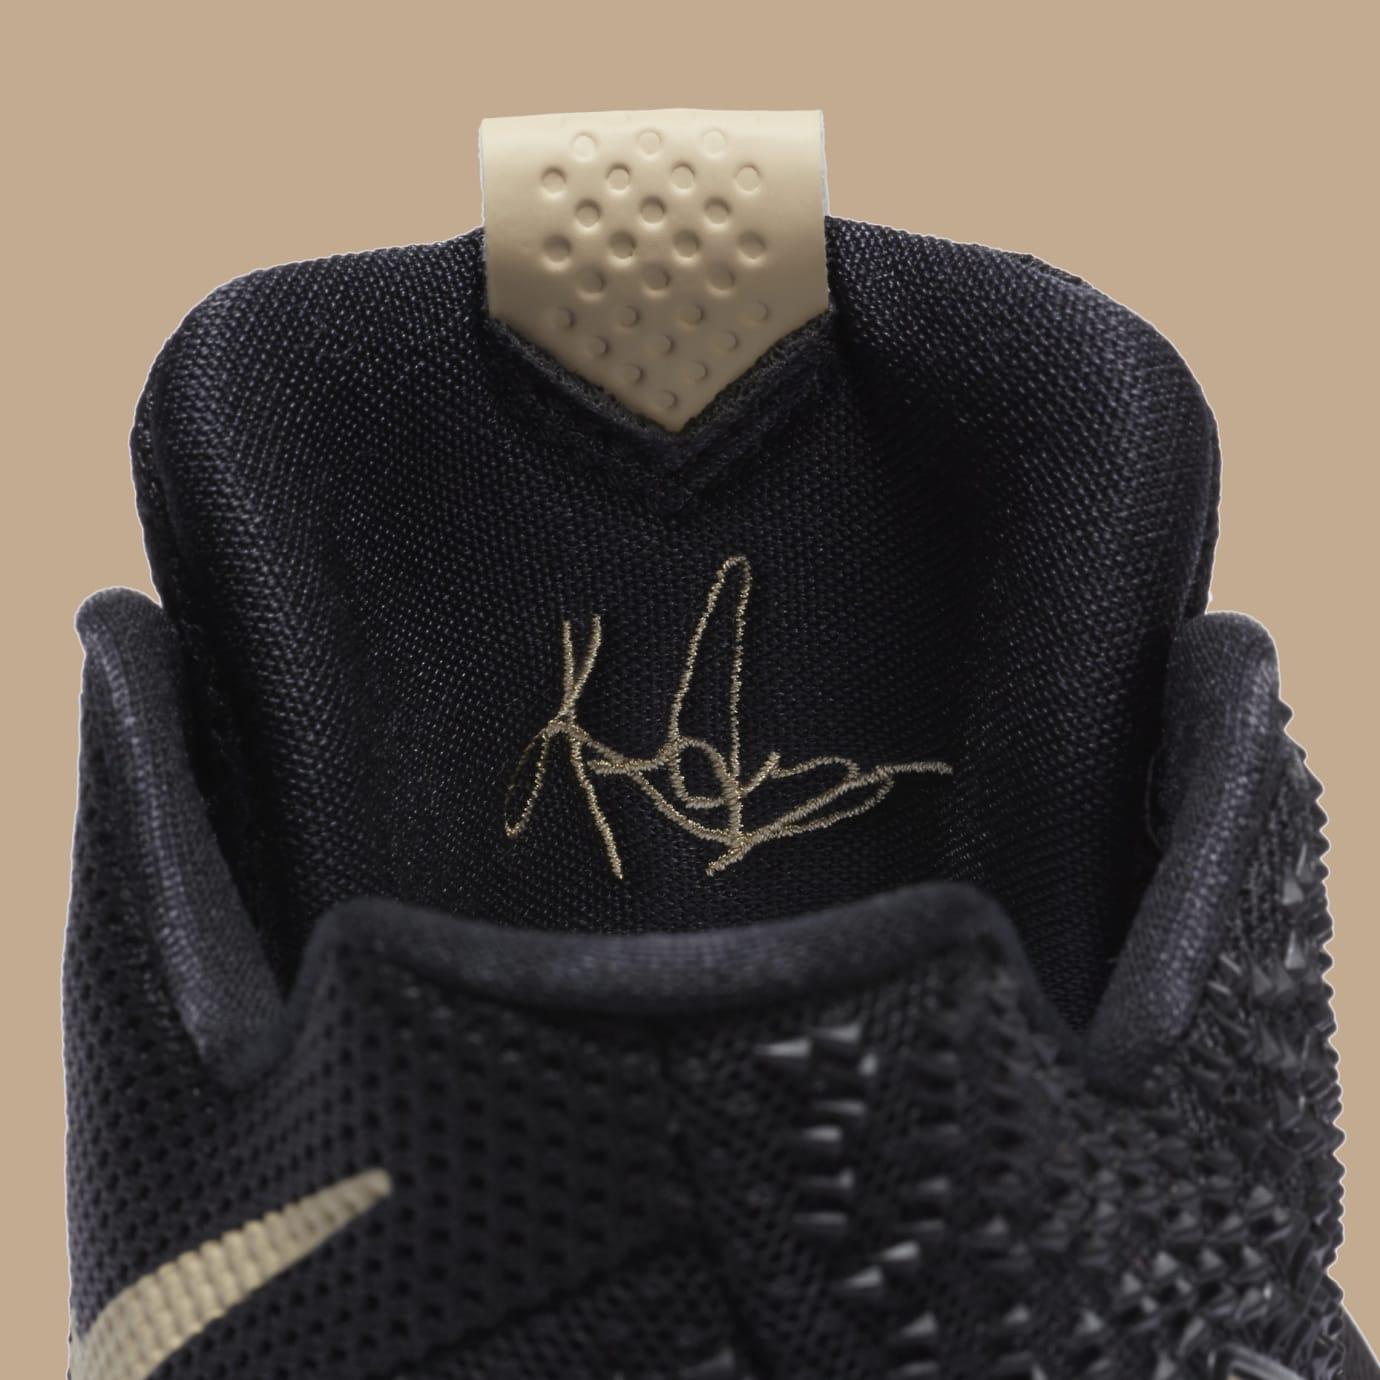 Nike Kyrie 3 No Diving 859466-092 Tongue